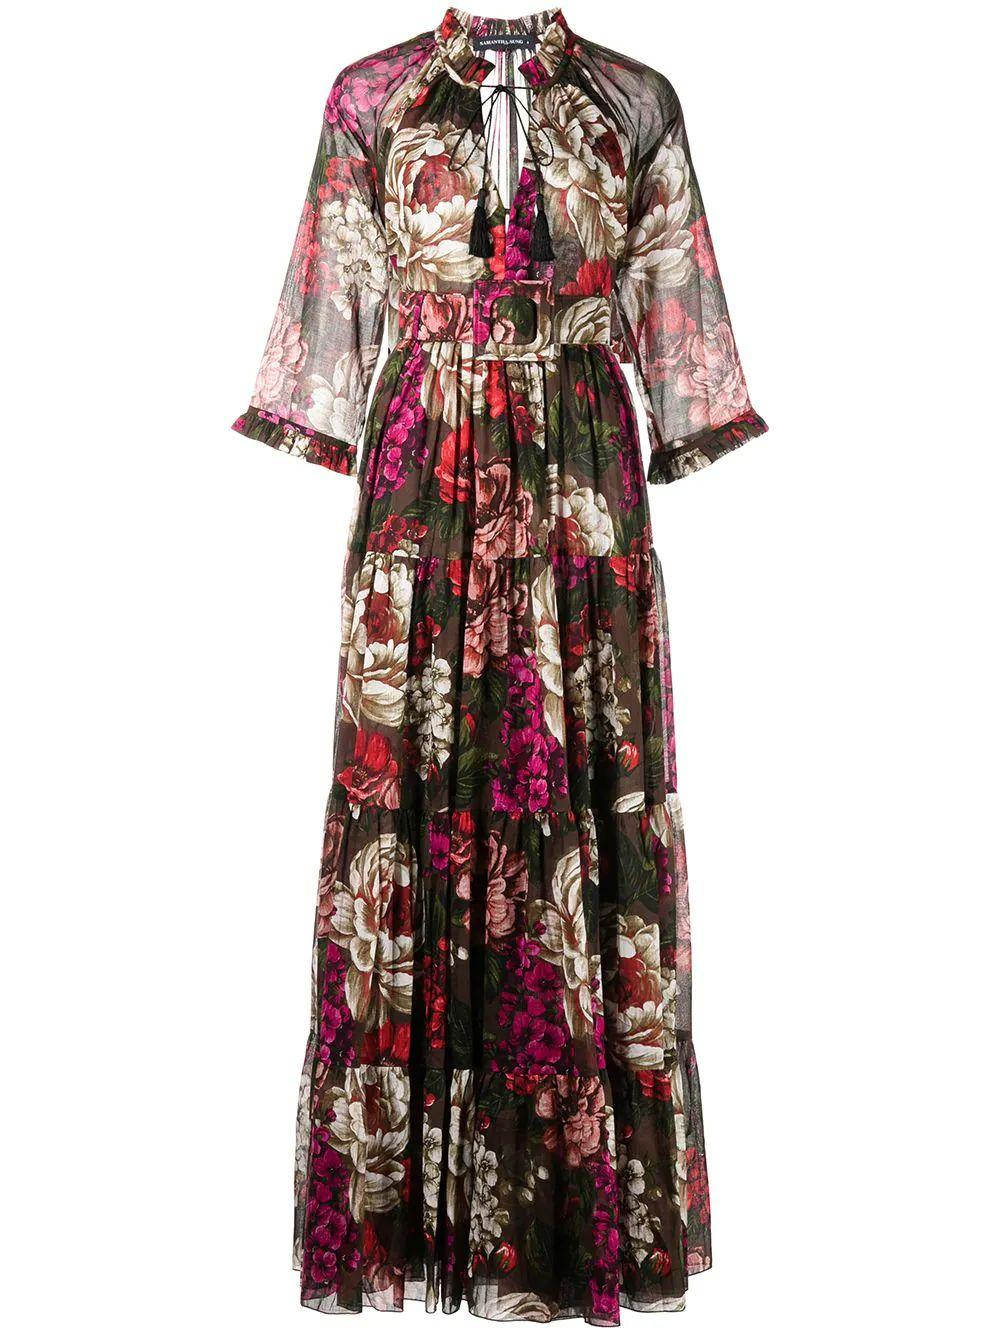 Eden Floral Maxi Dress Item # EDEN-F21